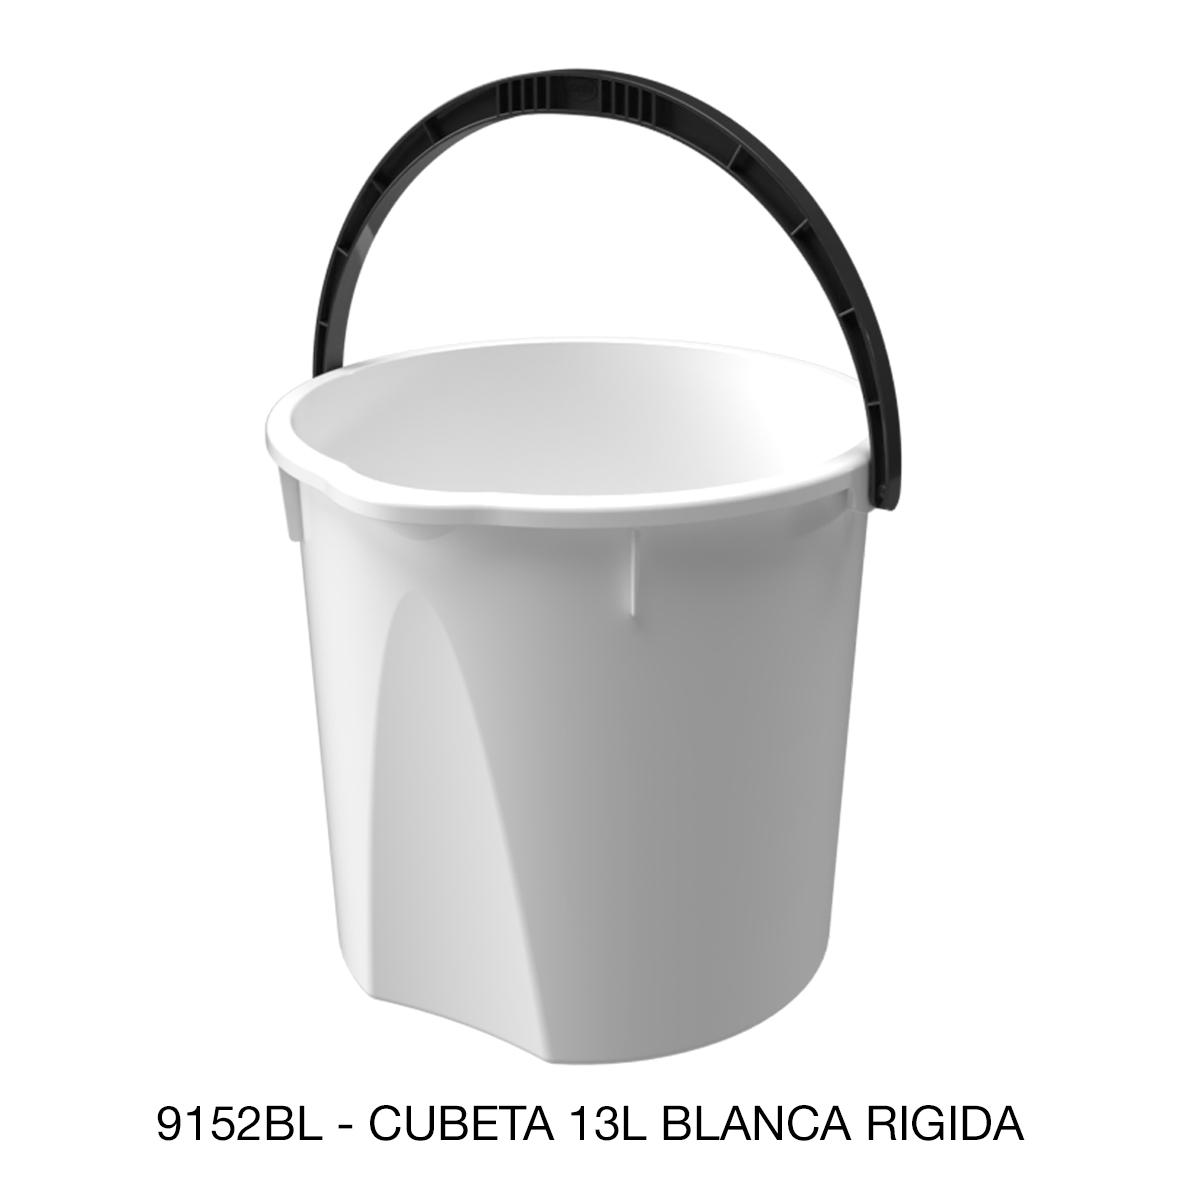 Cubeta rígida de 13 litros color blanco modelo 9152BL de Sablón